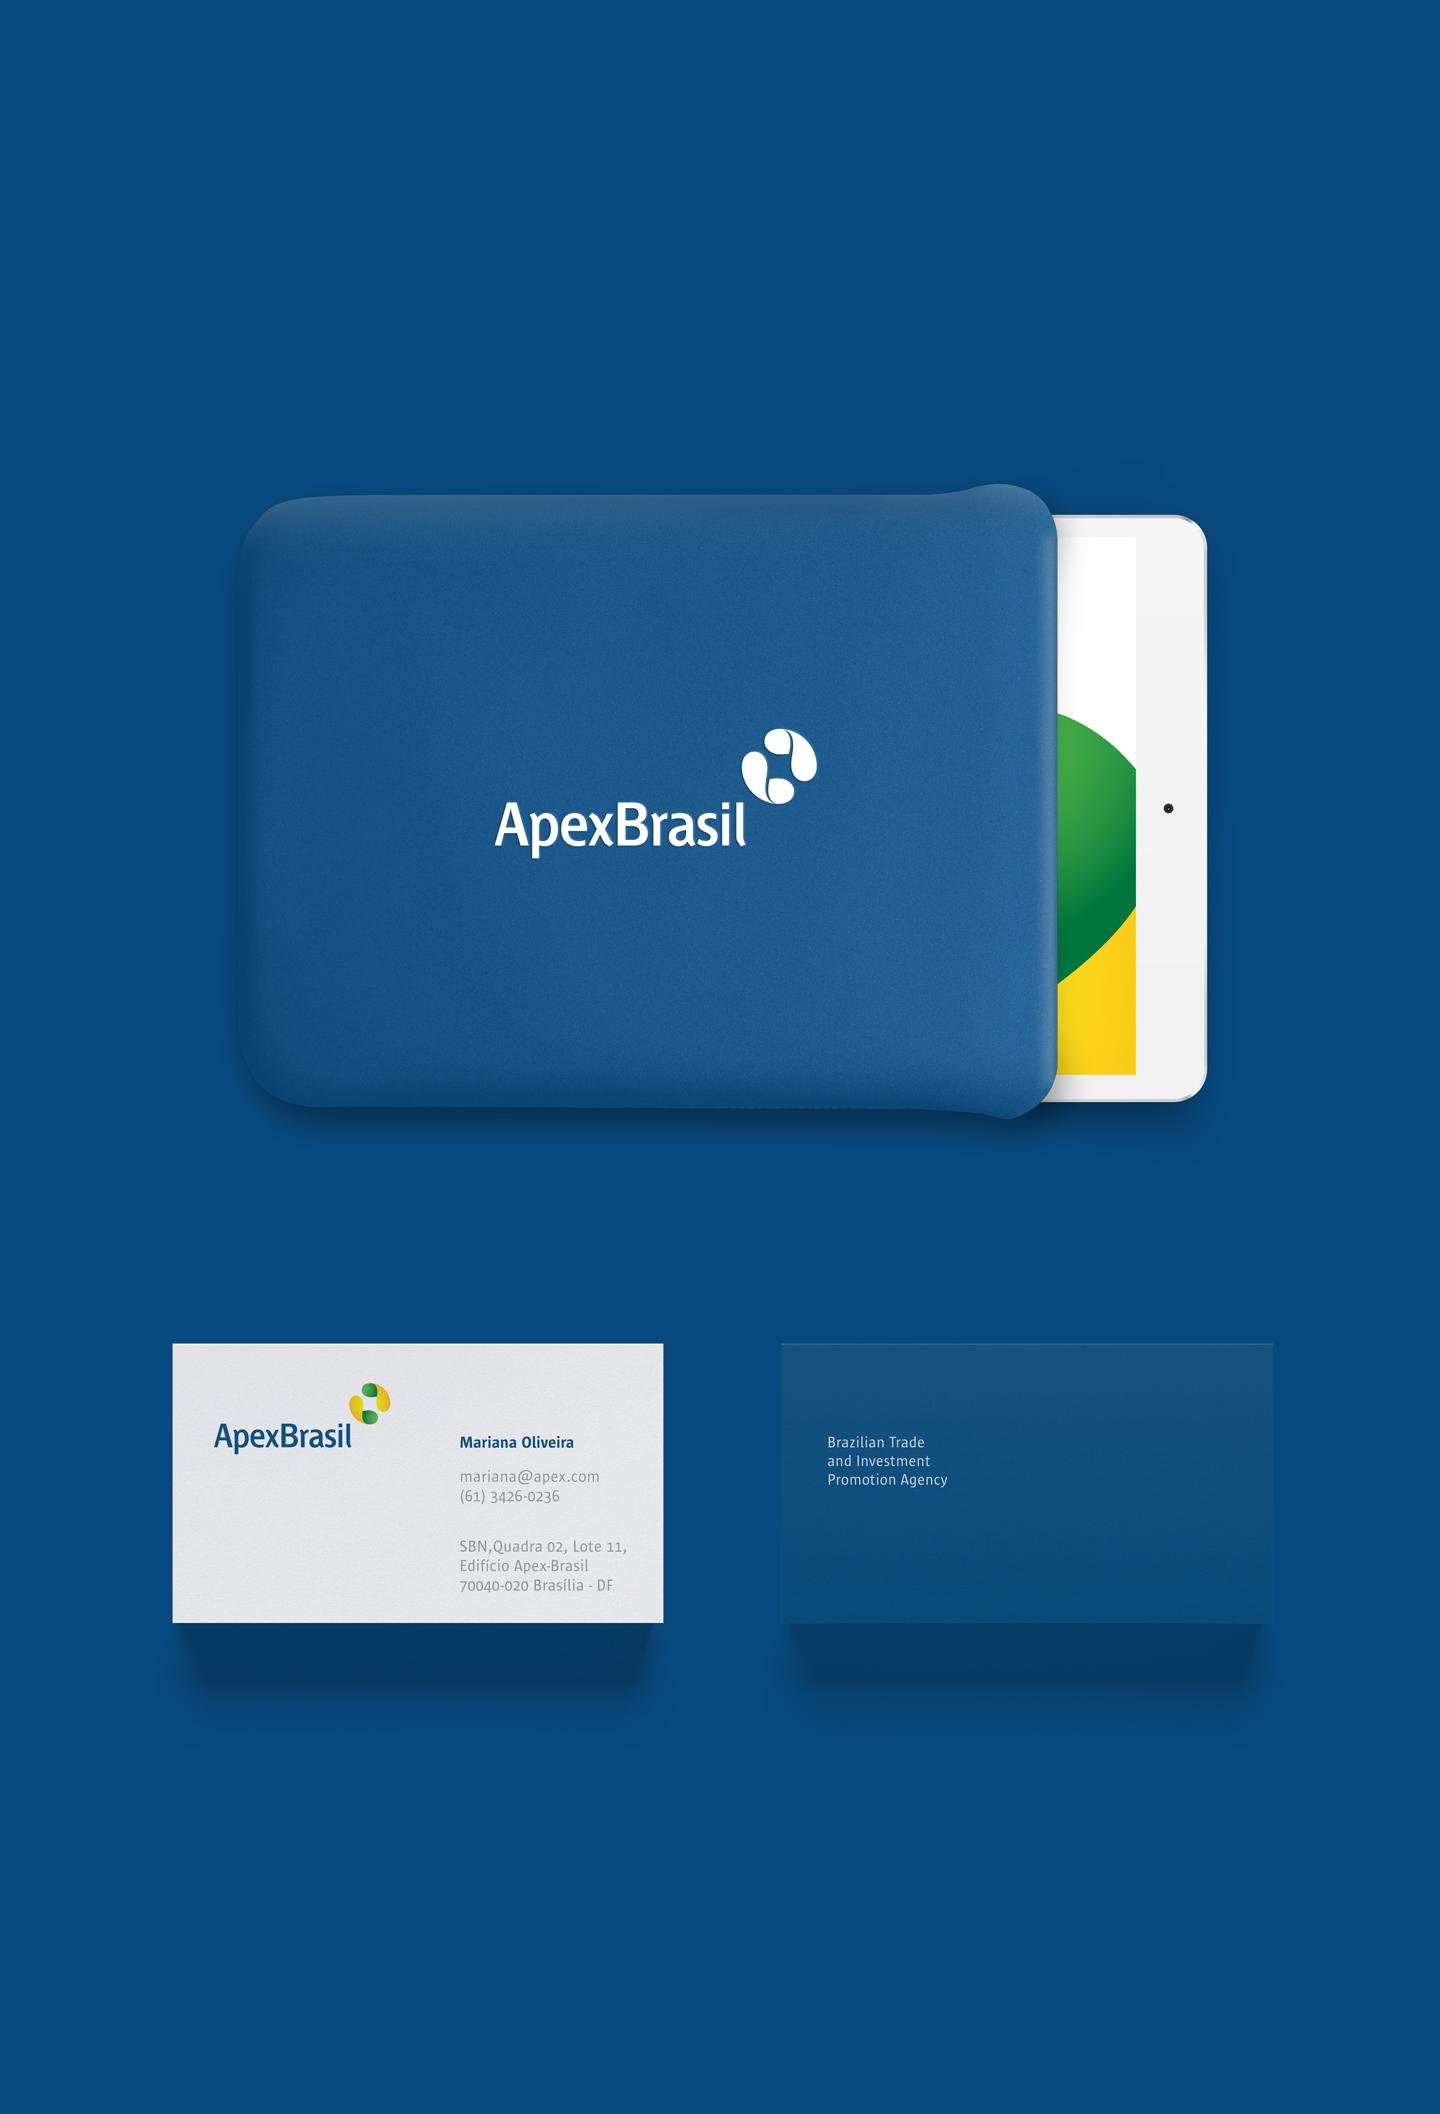 Apex-Brasil: Brand Identity